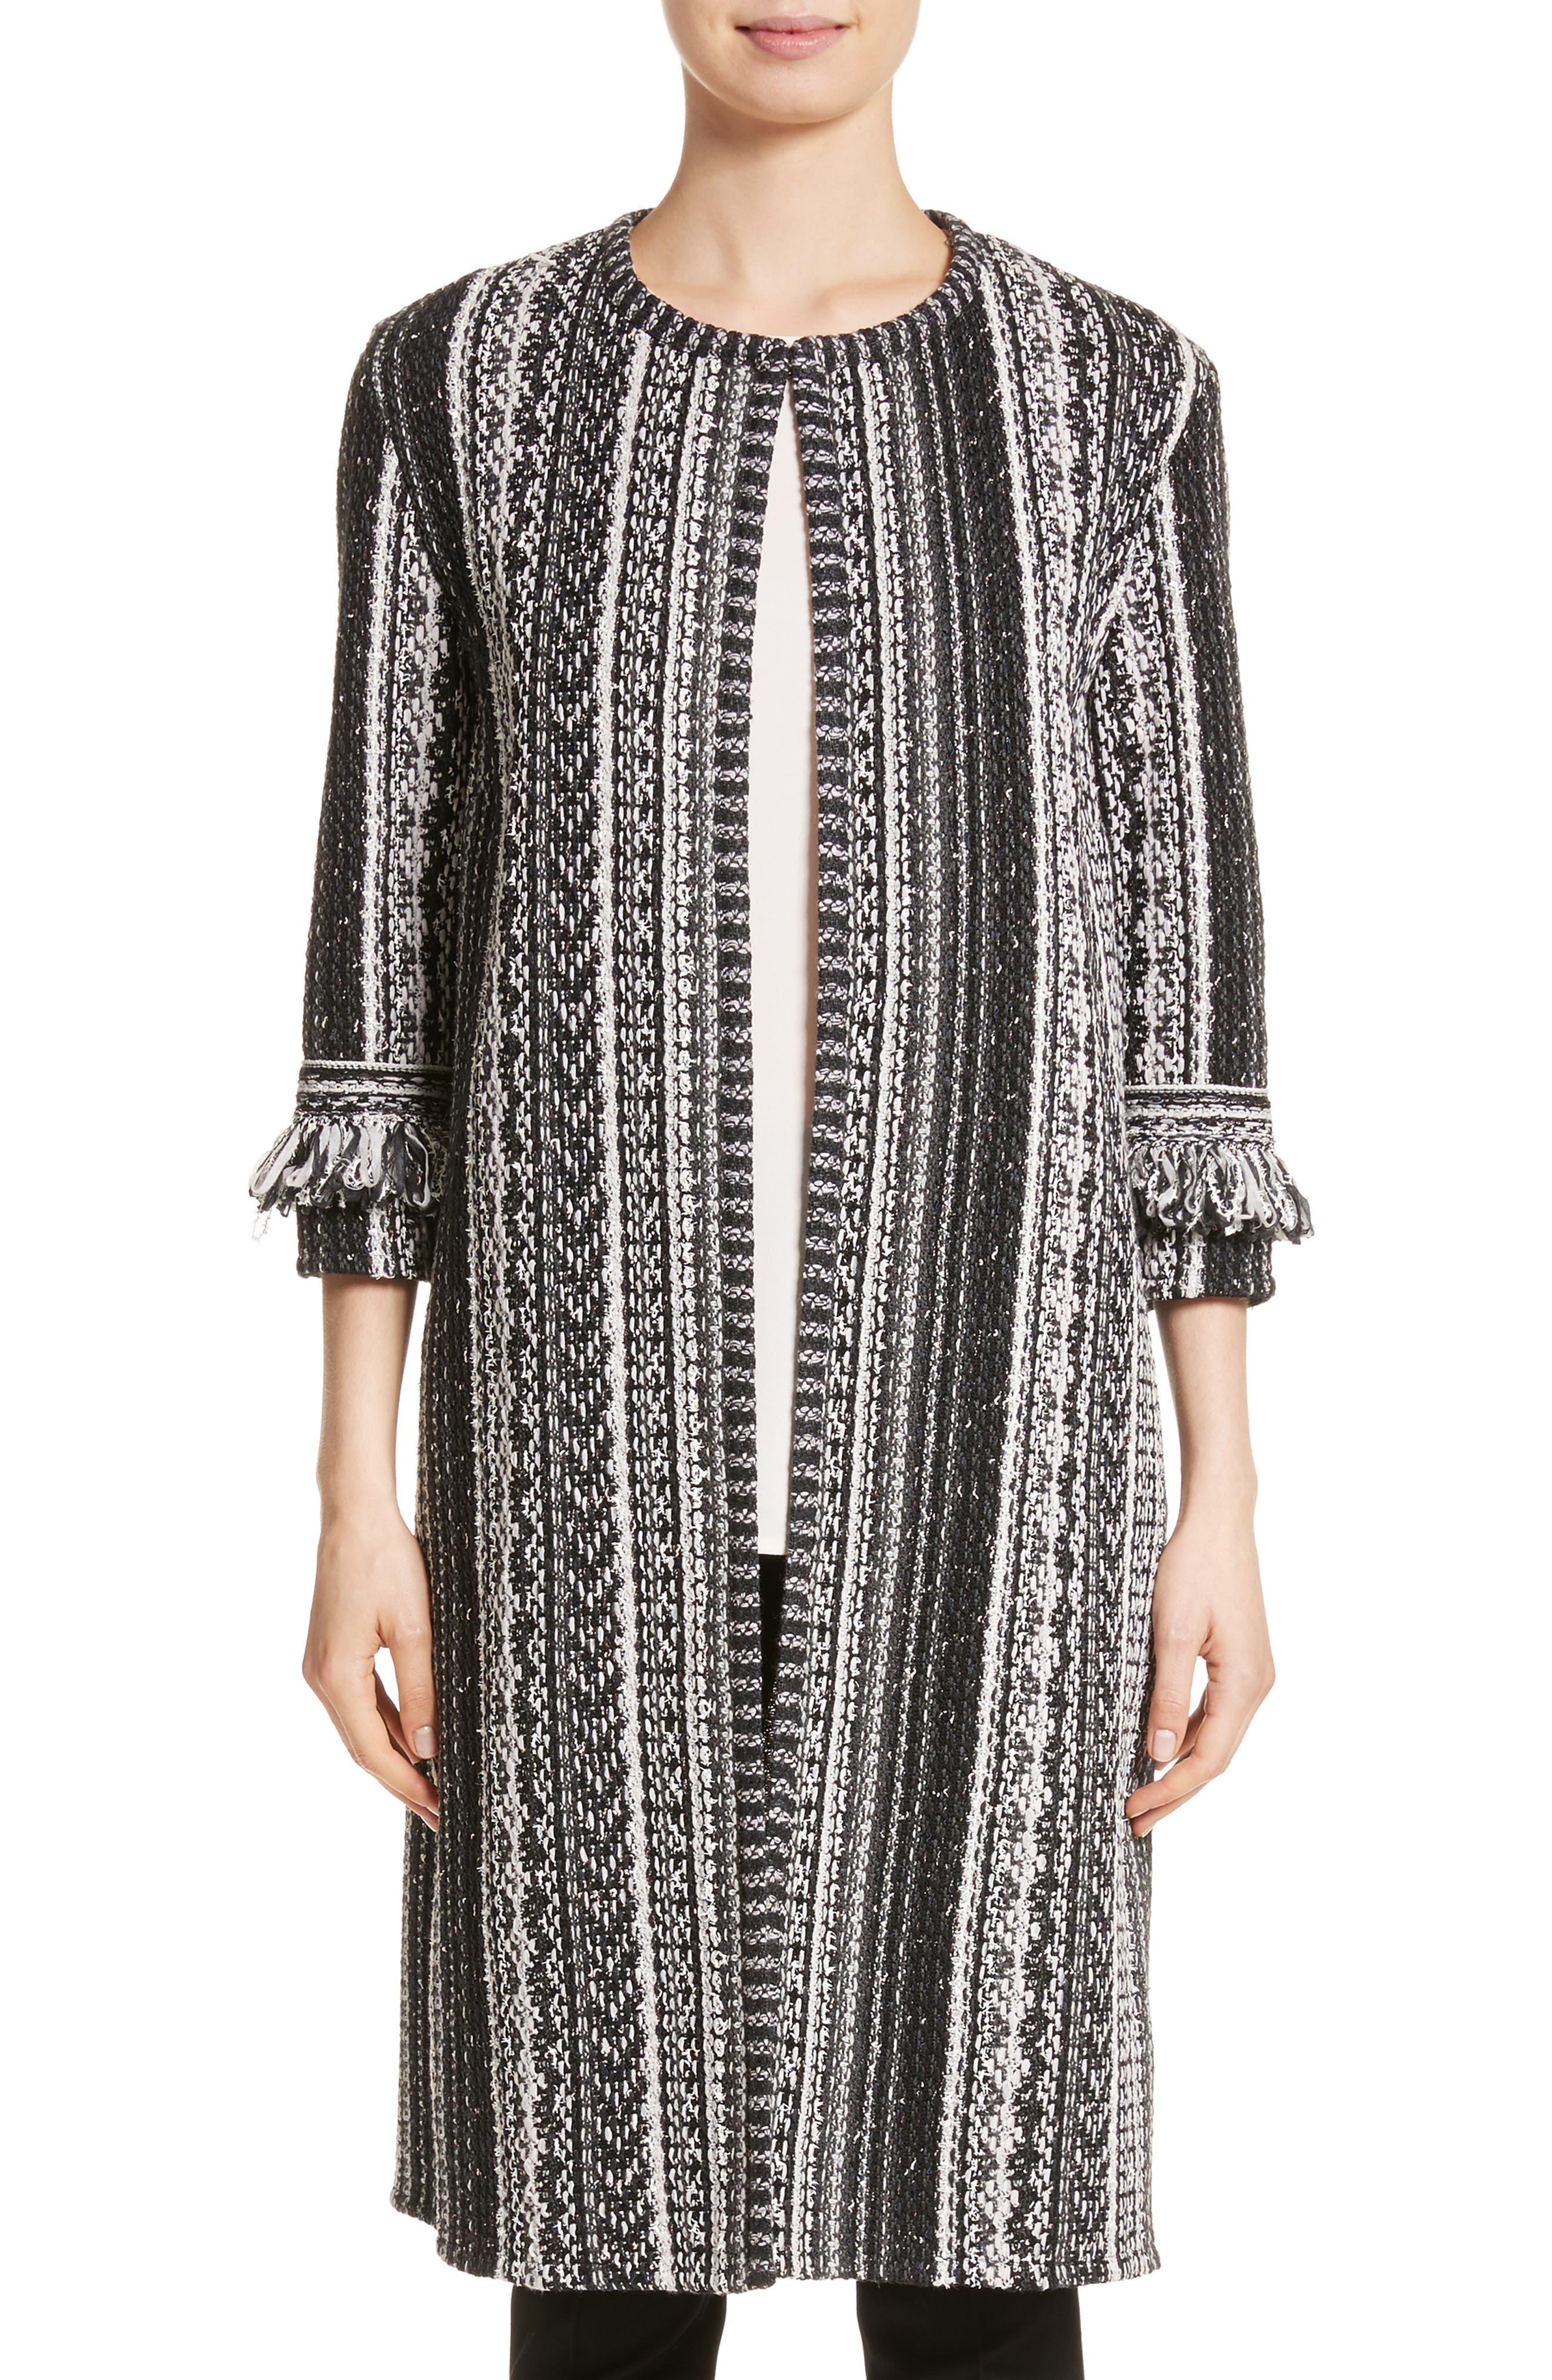 Fringe Ombré Stripe Tweed Knit Jacket,                             Main thumbnail 1, color,                             Caviar Multi